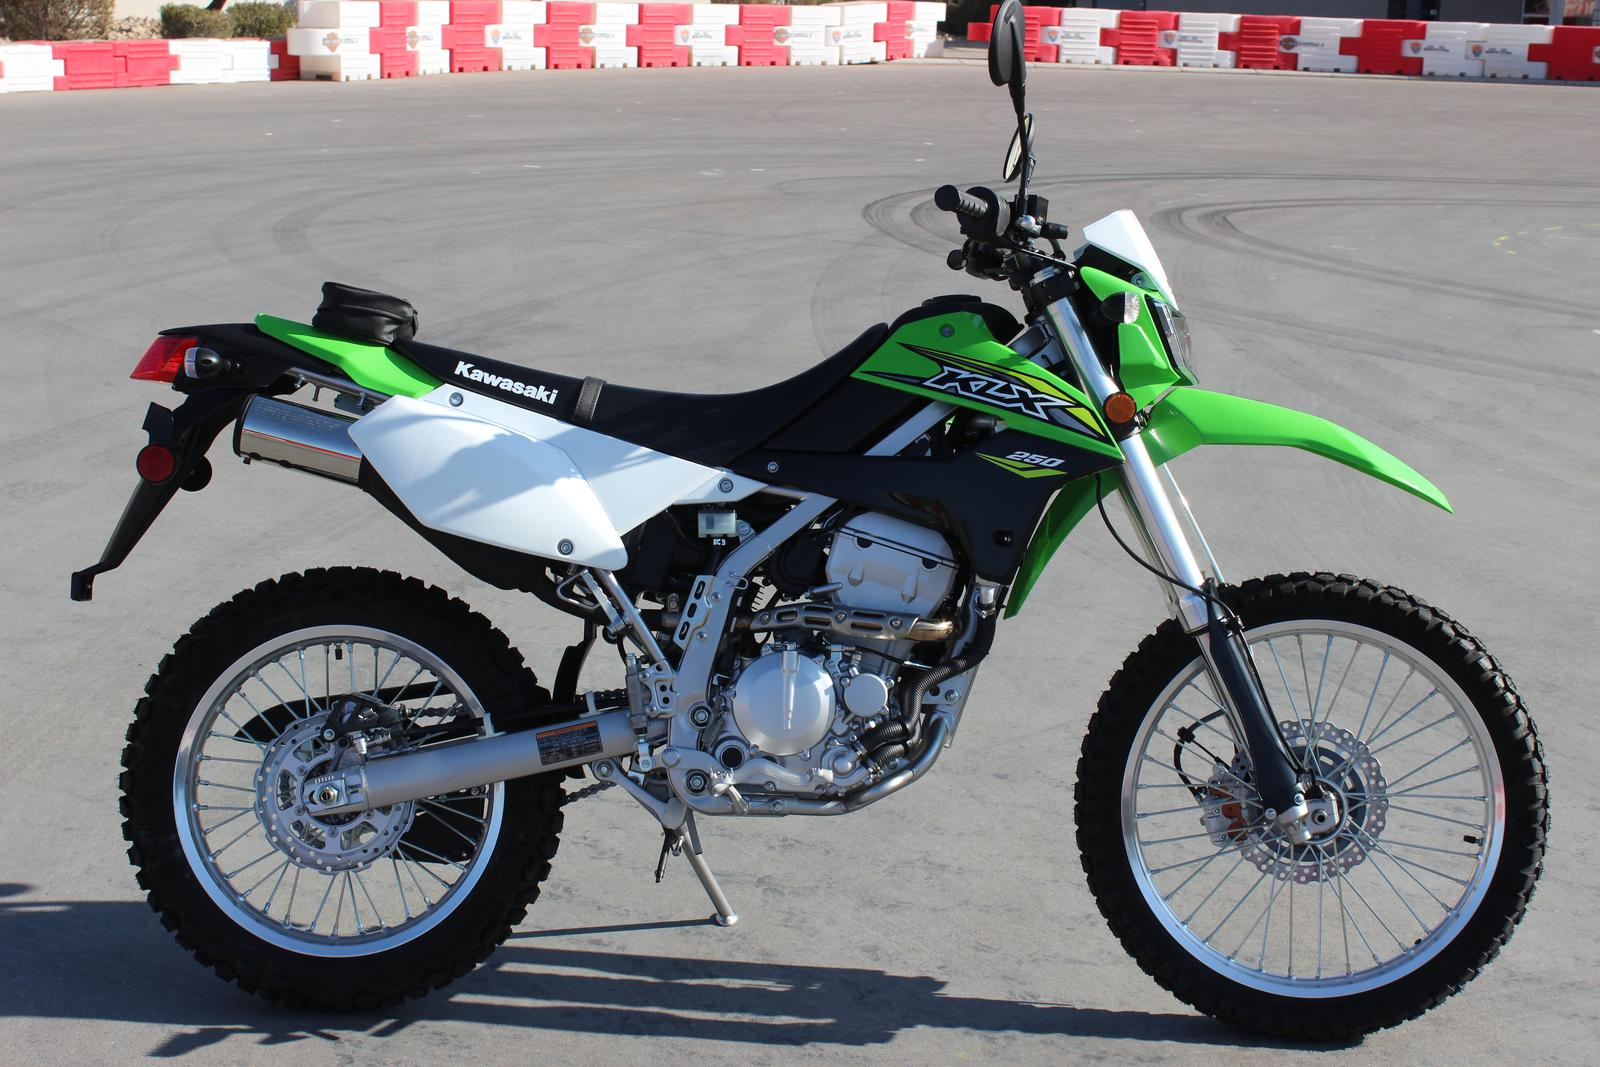 2018 Kawasaki KLX250 for sale in Scottsdale, AZ | GO AZ Motorcycles ...